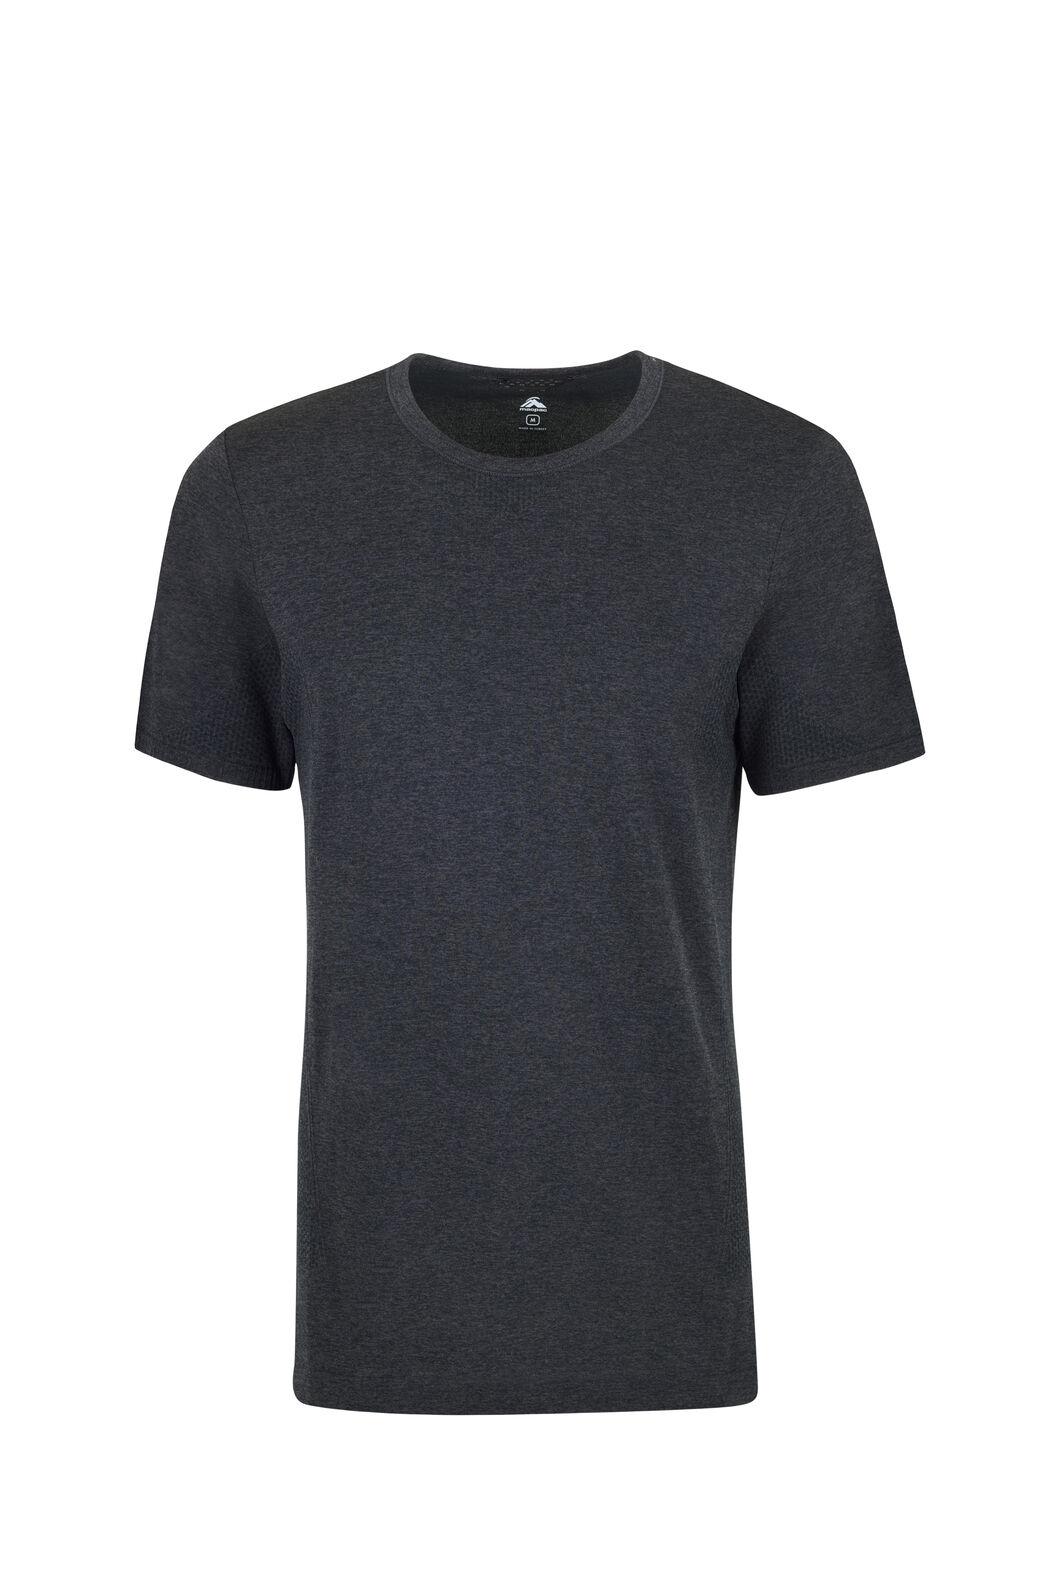 Macpac Limitless Short Sleeve Tee - Men's, Black, hi-res